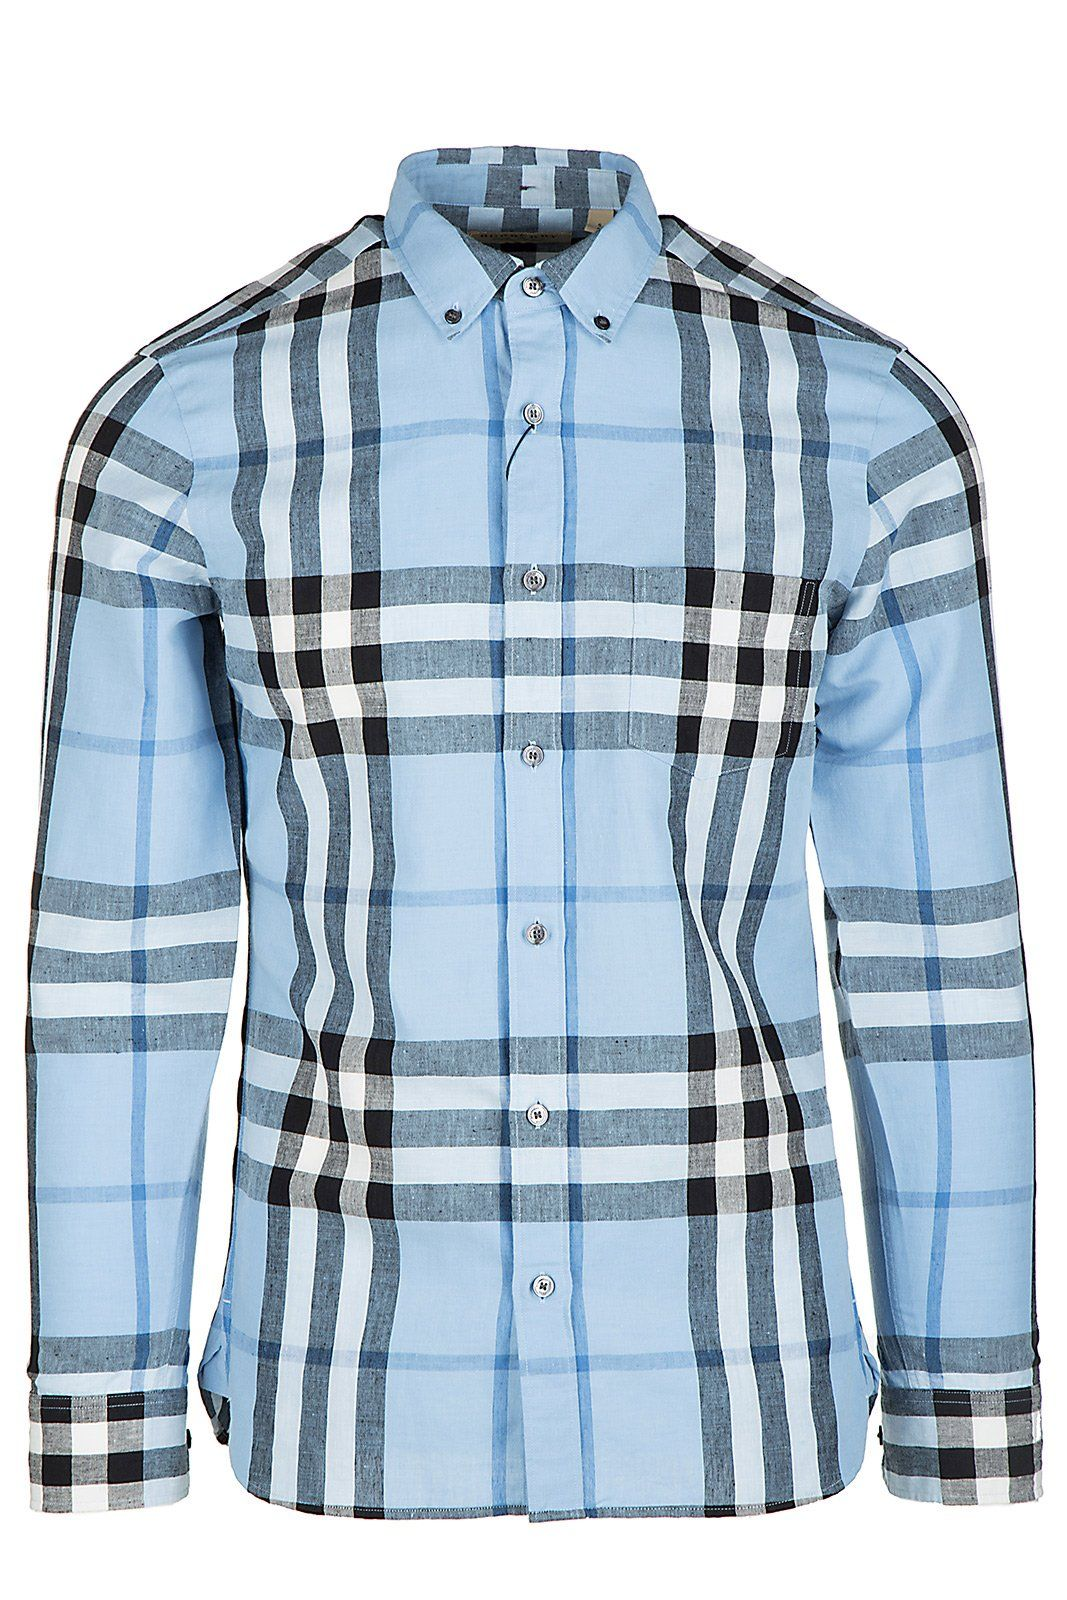 Burberry menus long sleeve shirt dress shirt blu us size m us